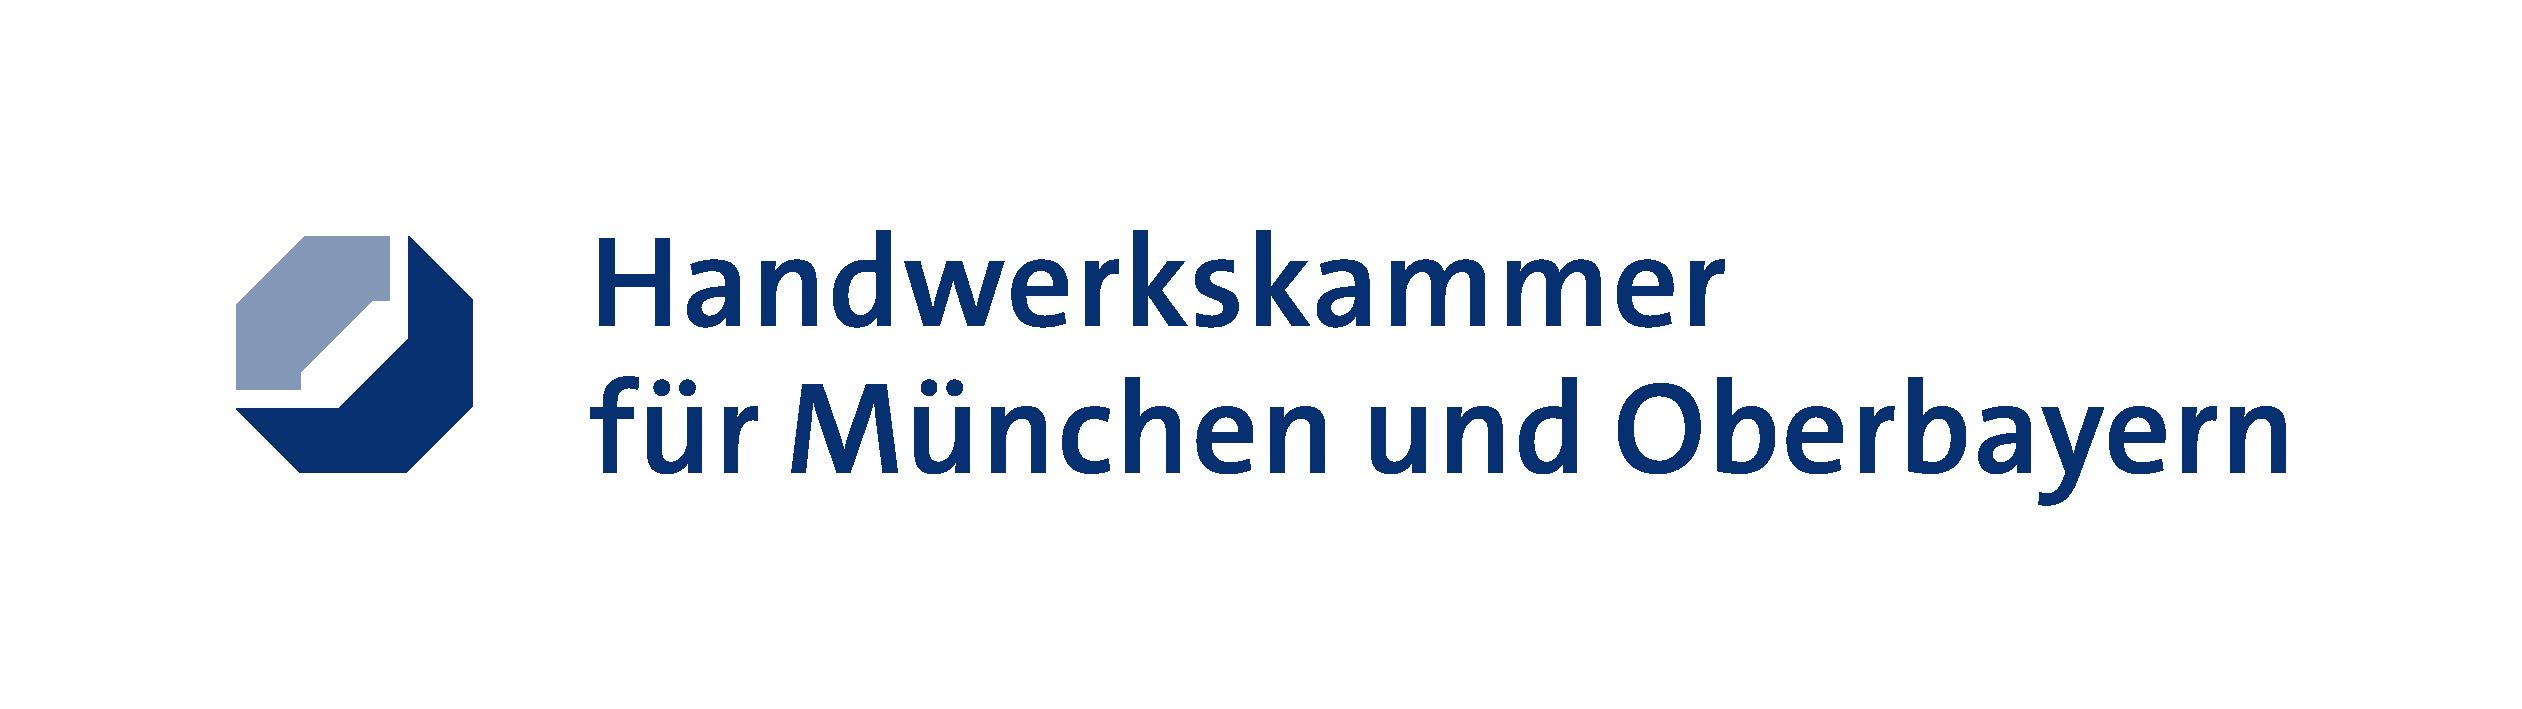 hwk_muenchen_und_oberbayern_rgb_s